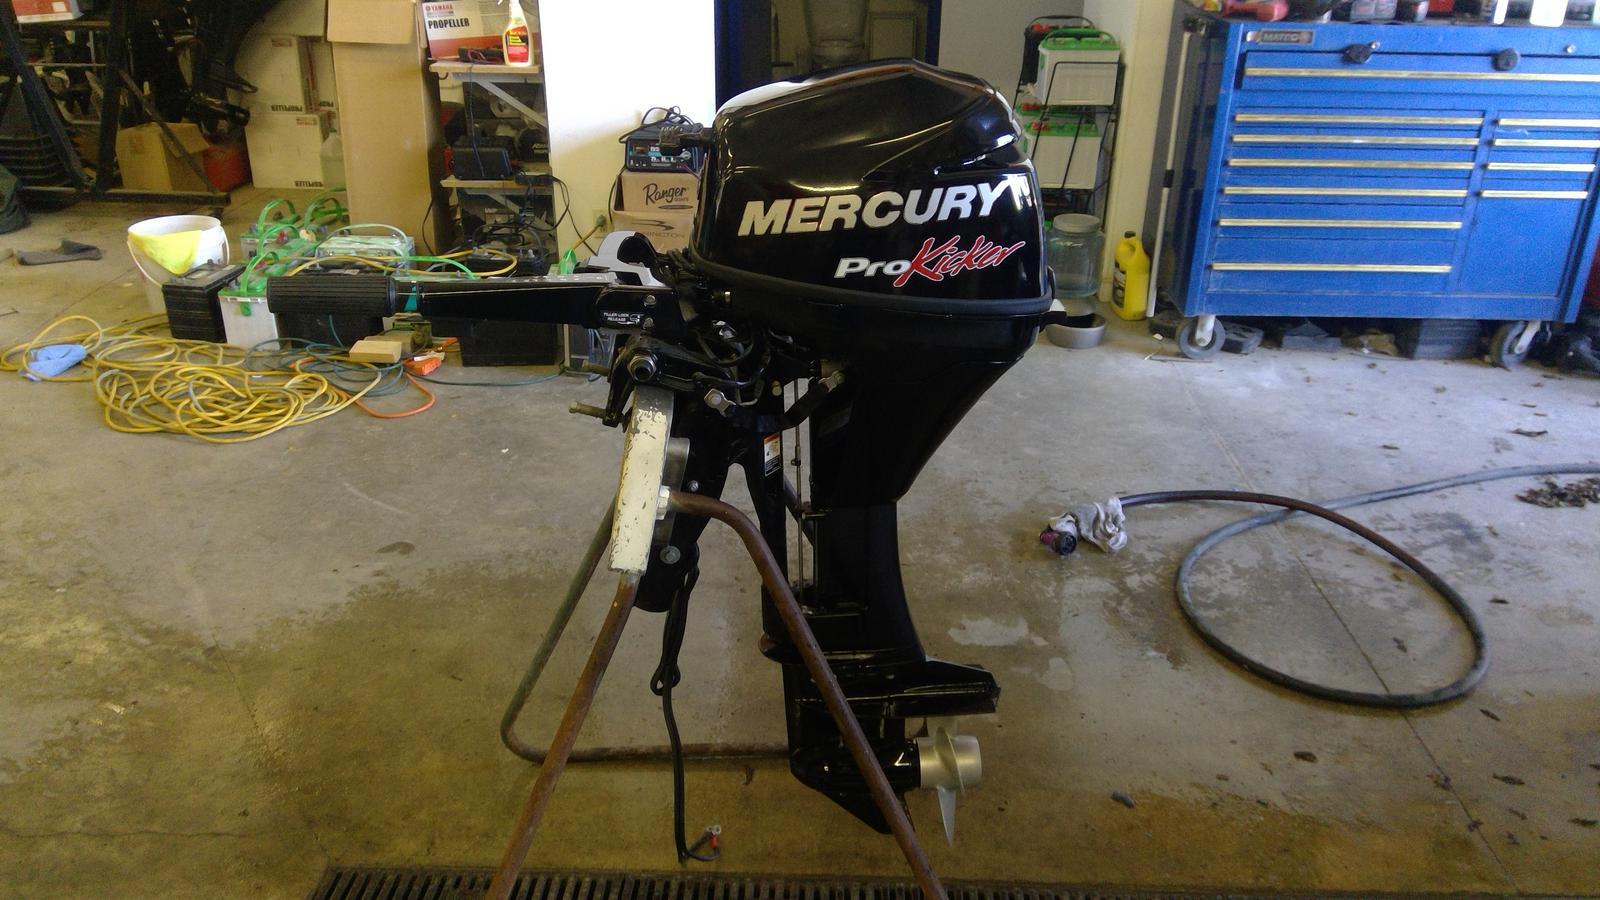 Outboard Motors from Mercury Quam's Marine & Motor Sports